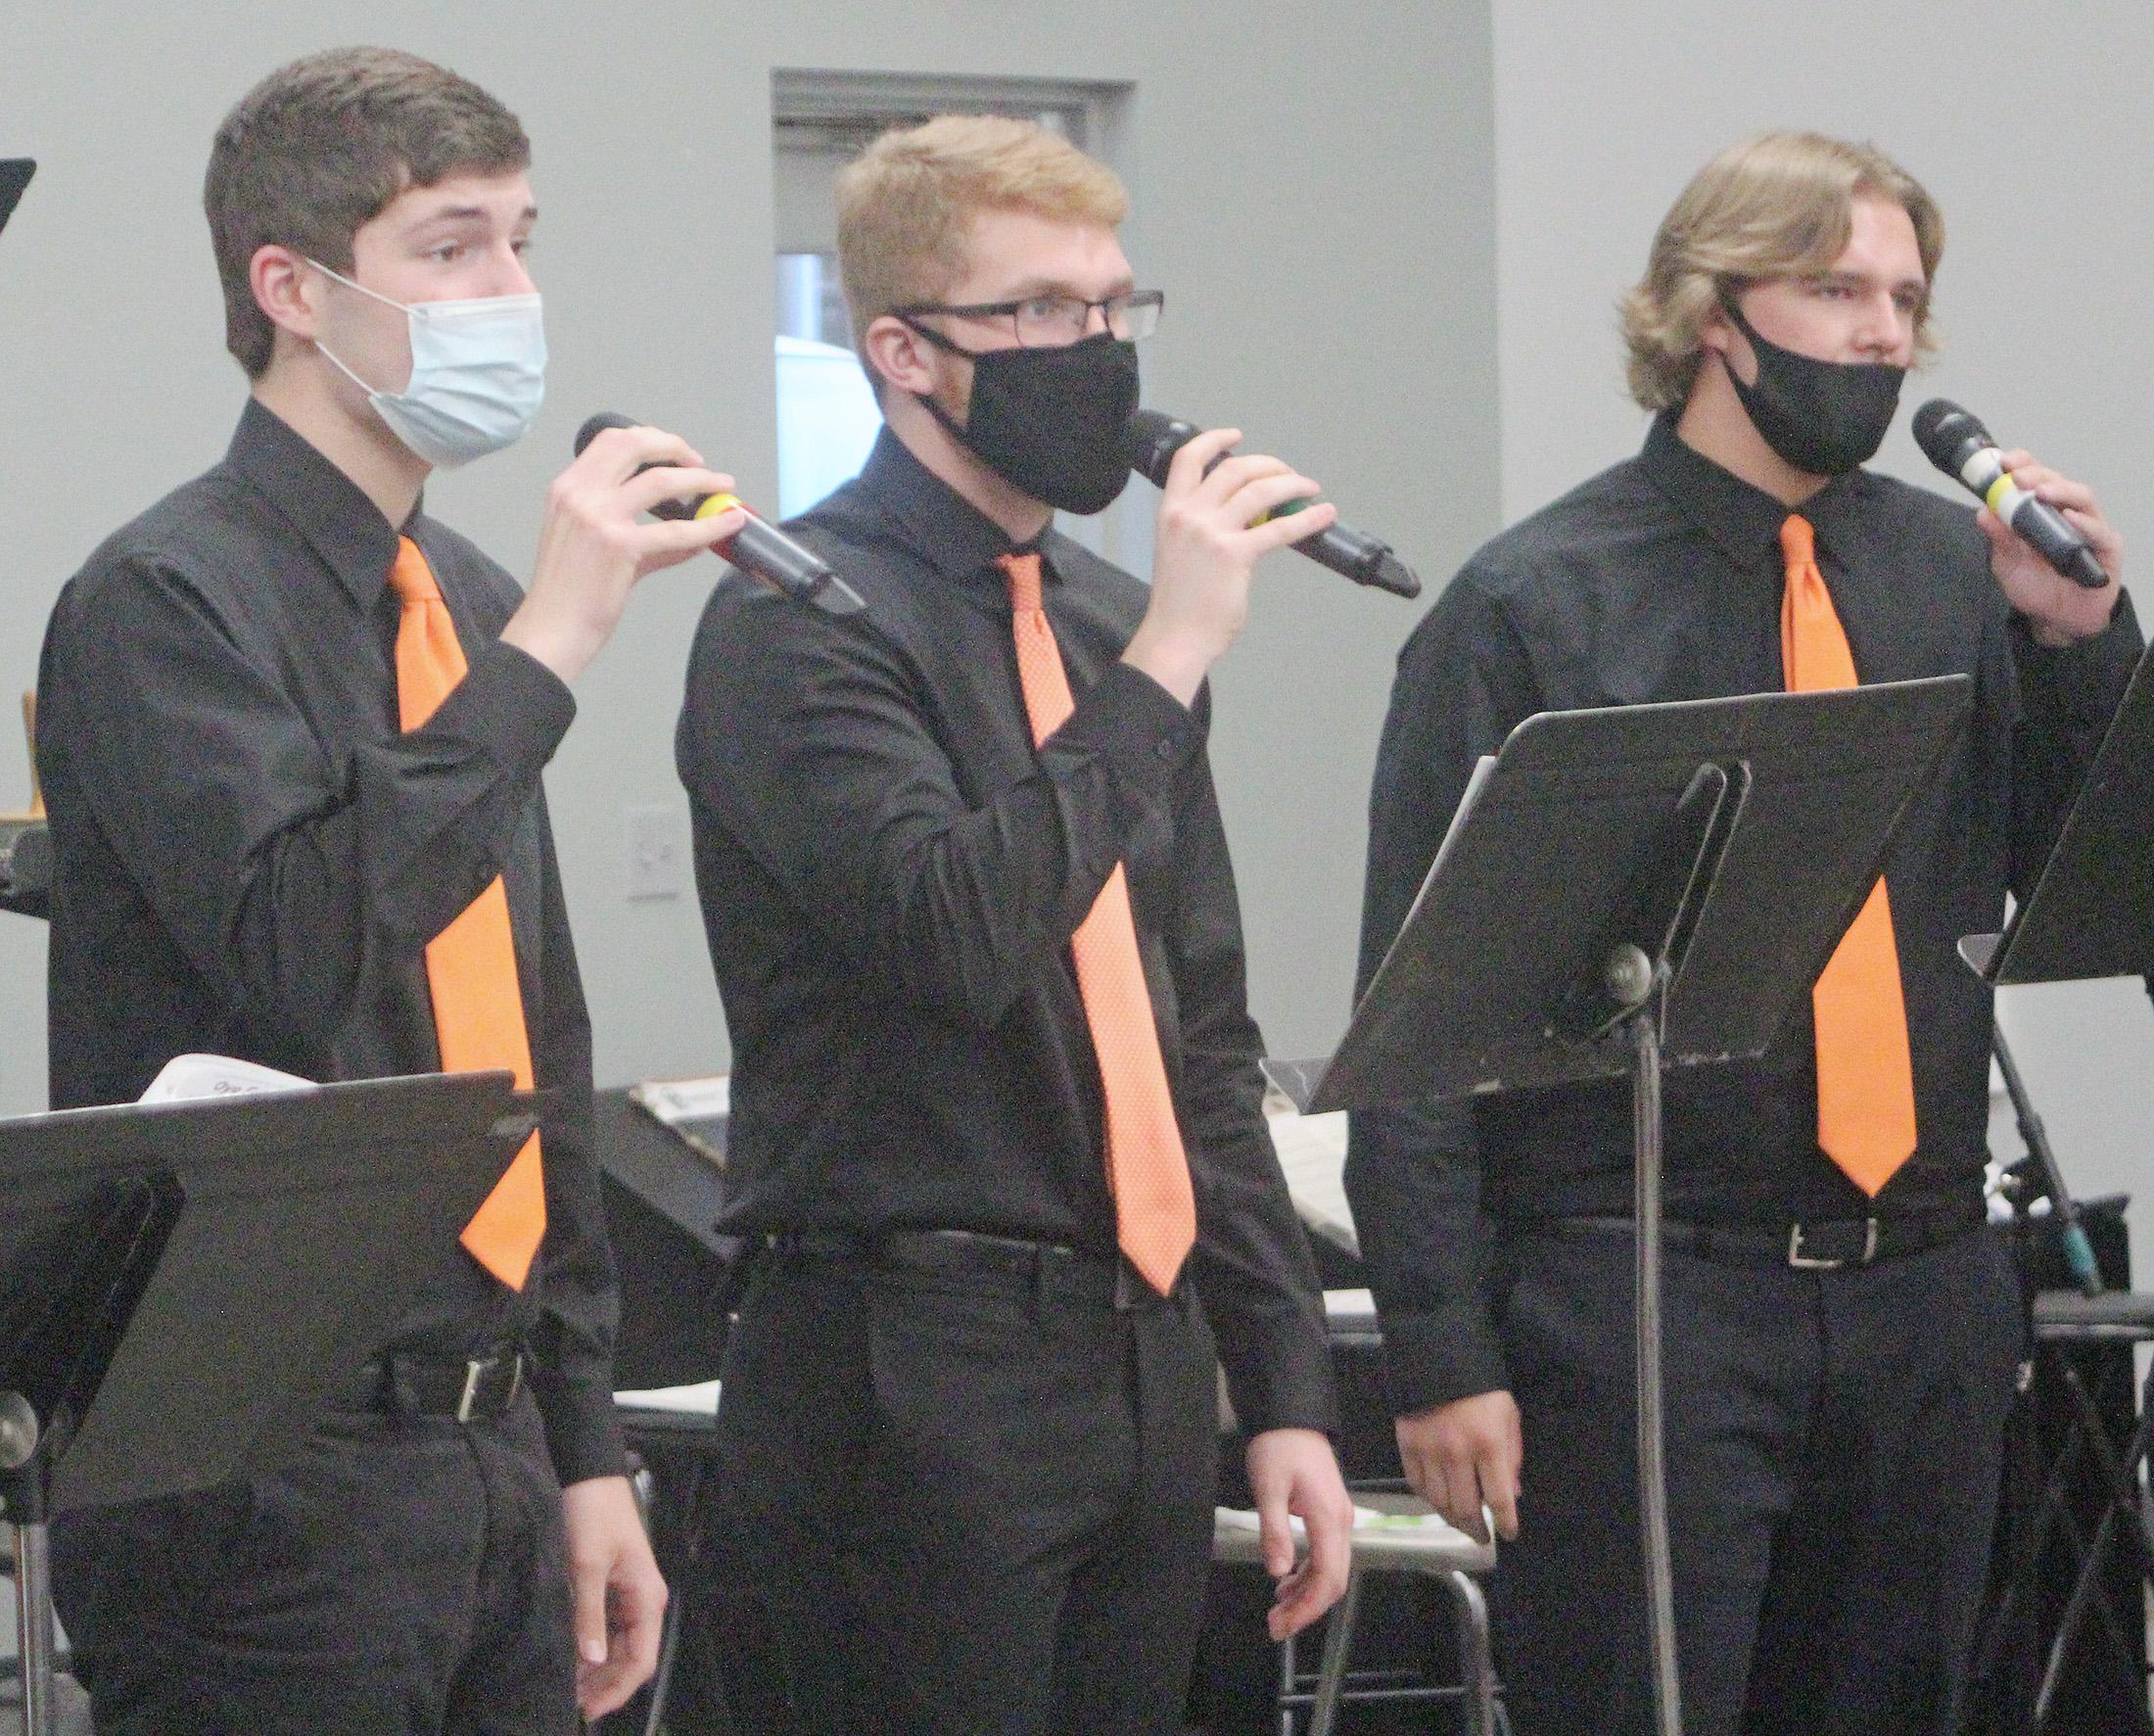 Charles City High School music groups jive and jazz